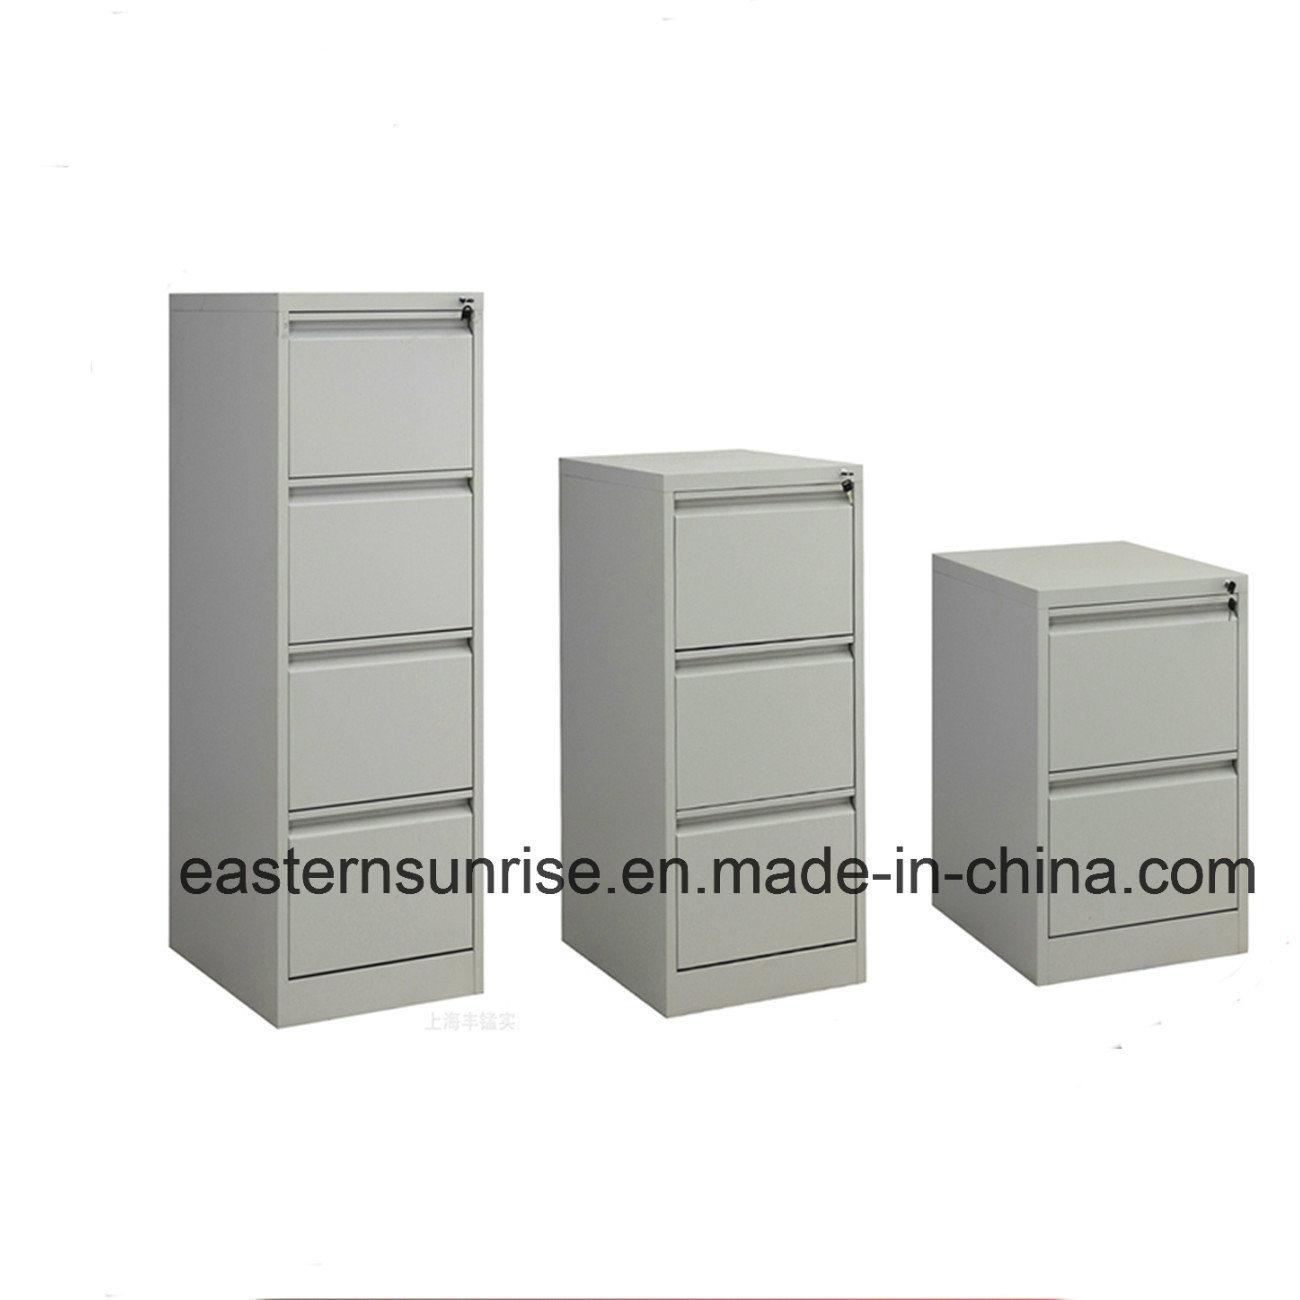 UL Certified Fire Resistant Vertical Filing Cabinet